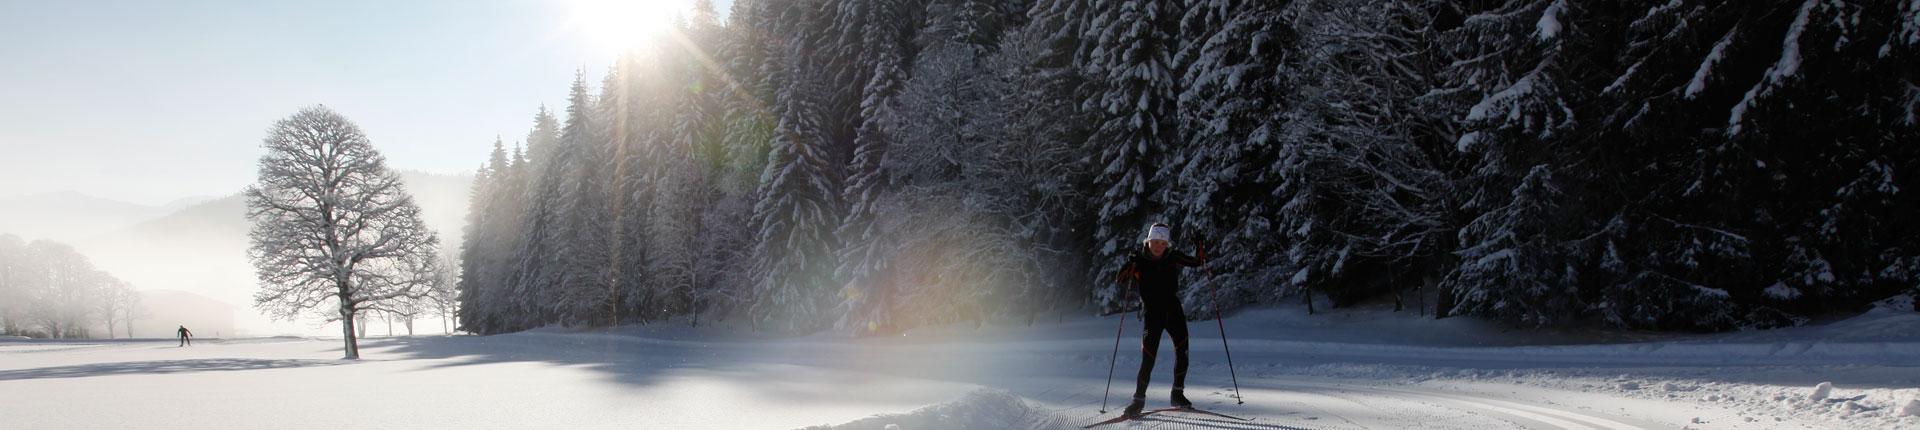 Langlaufen im Winterurlaub